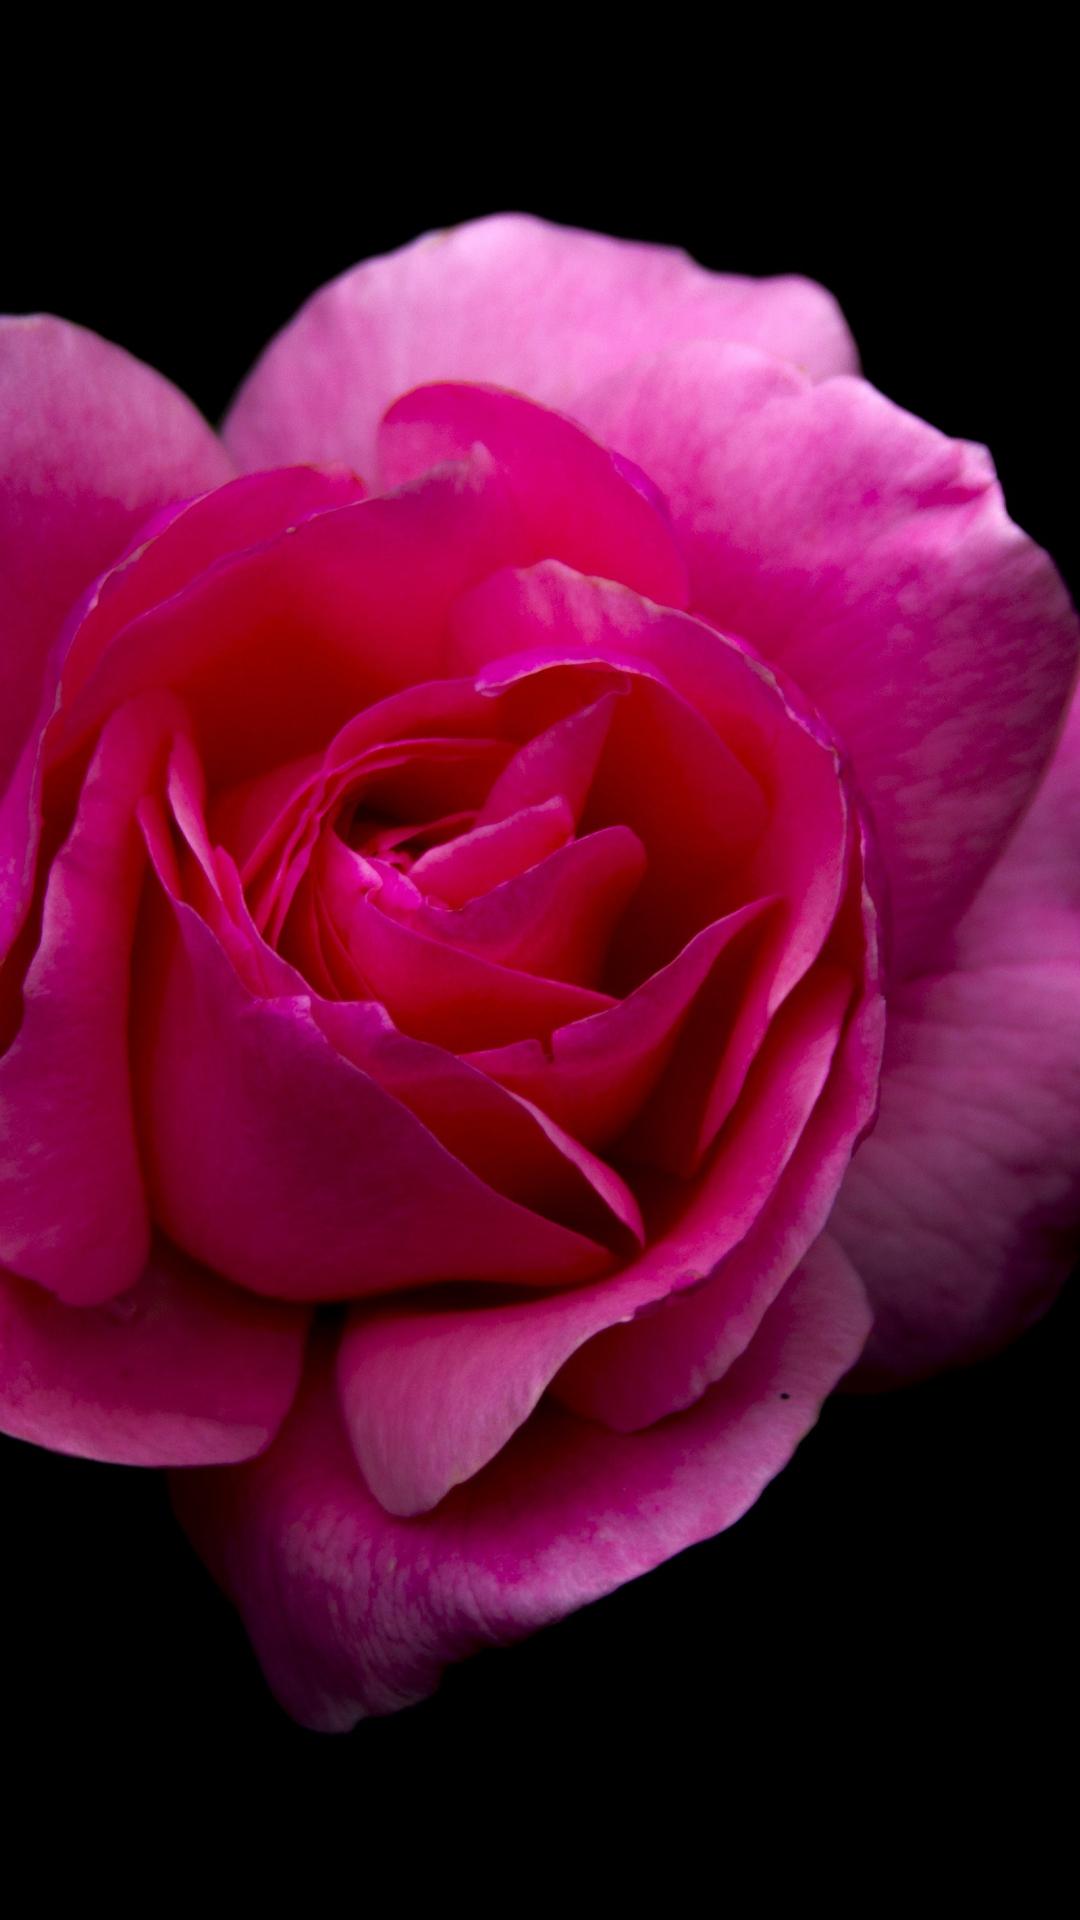 Download 1080x1920 Wallpaper Rose Pink Flower Portrait Samsung Galaxy S4 S5 Note Sony Xperia Z Z1 Z2 Z3 Htc One Lenovo Vibe Google Pixel 2 Oneplus 5 Honor 9 Xiaomi Redmi Note